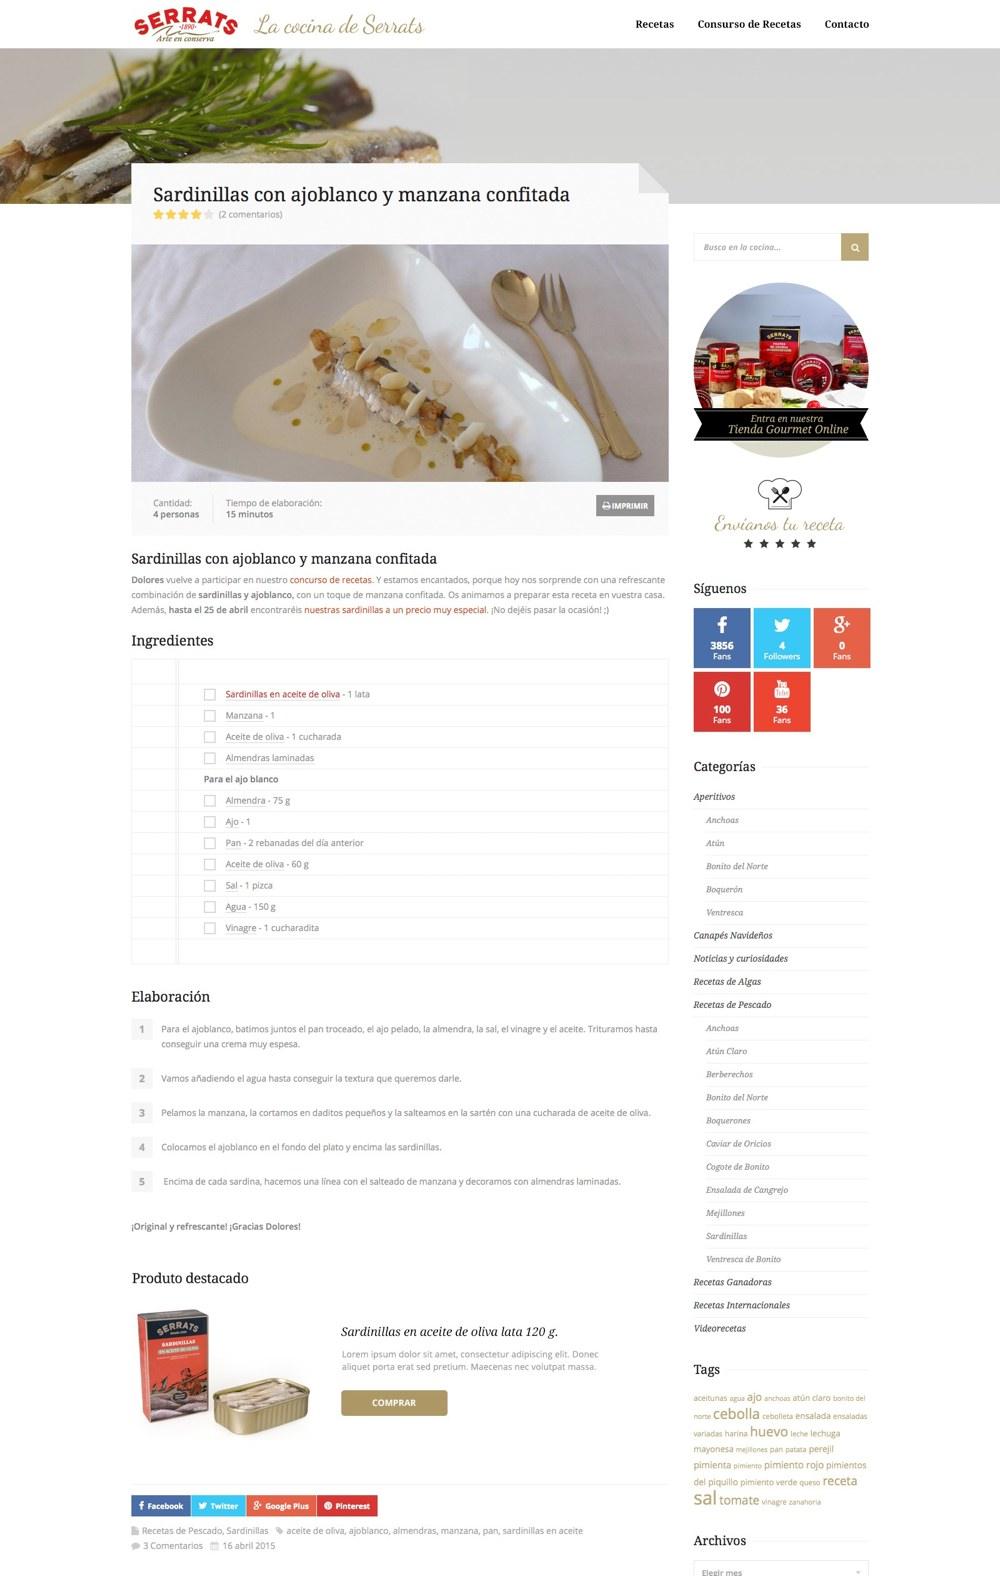 Detalle de una receta en La cocina de Serrats